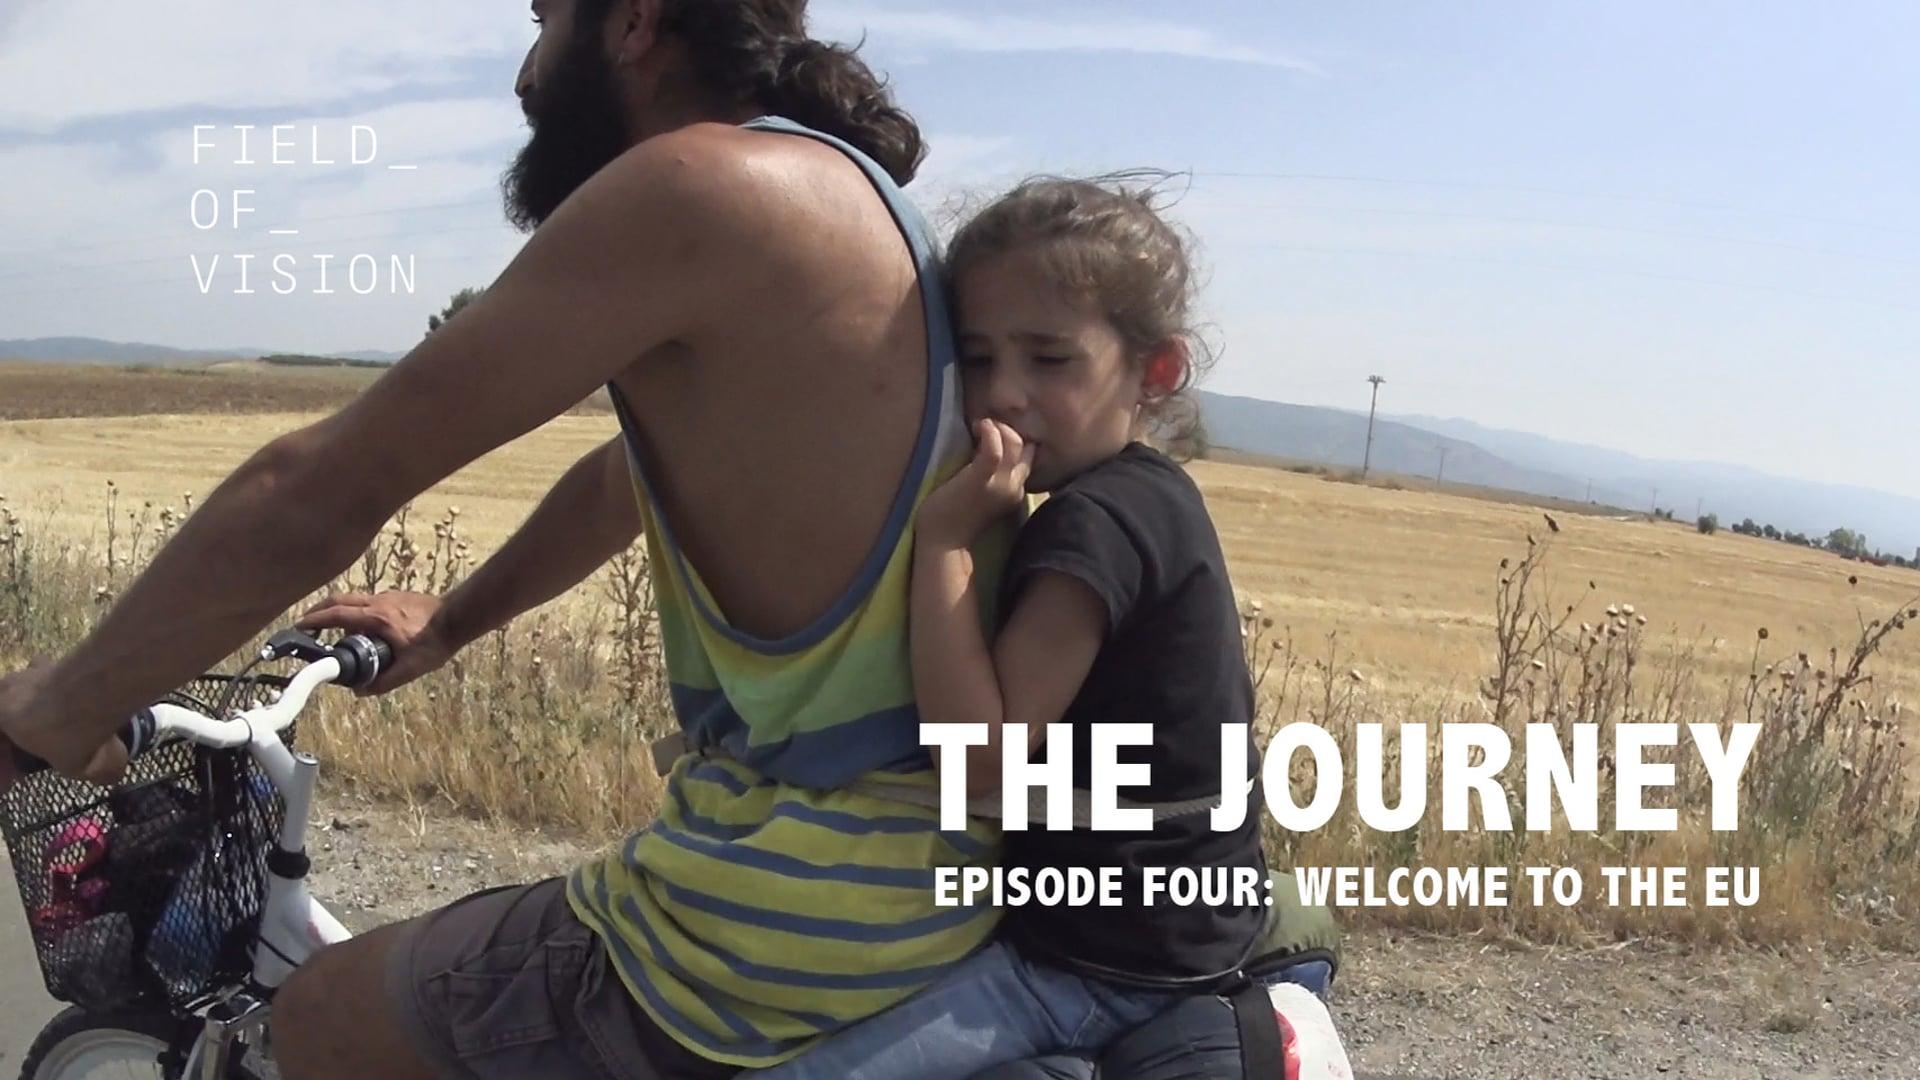 Episode Four: Welcome to the EU